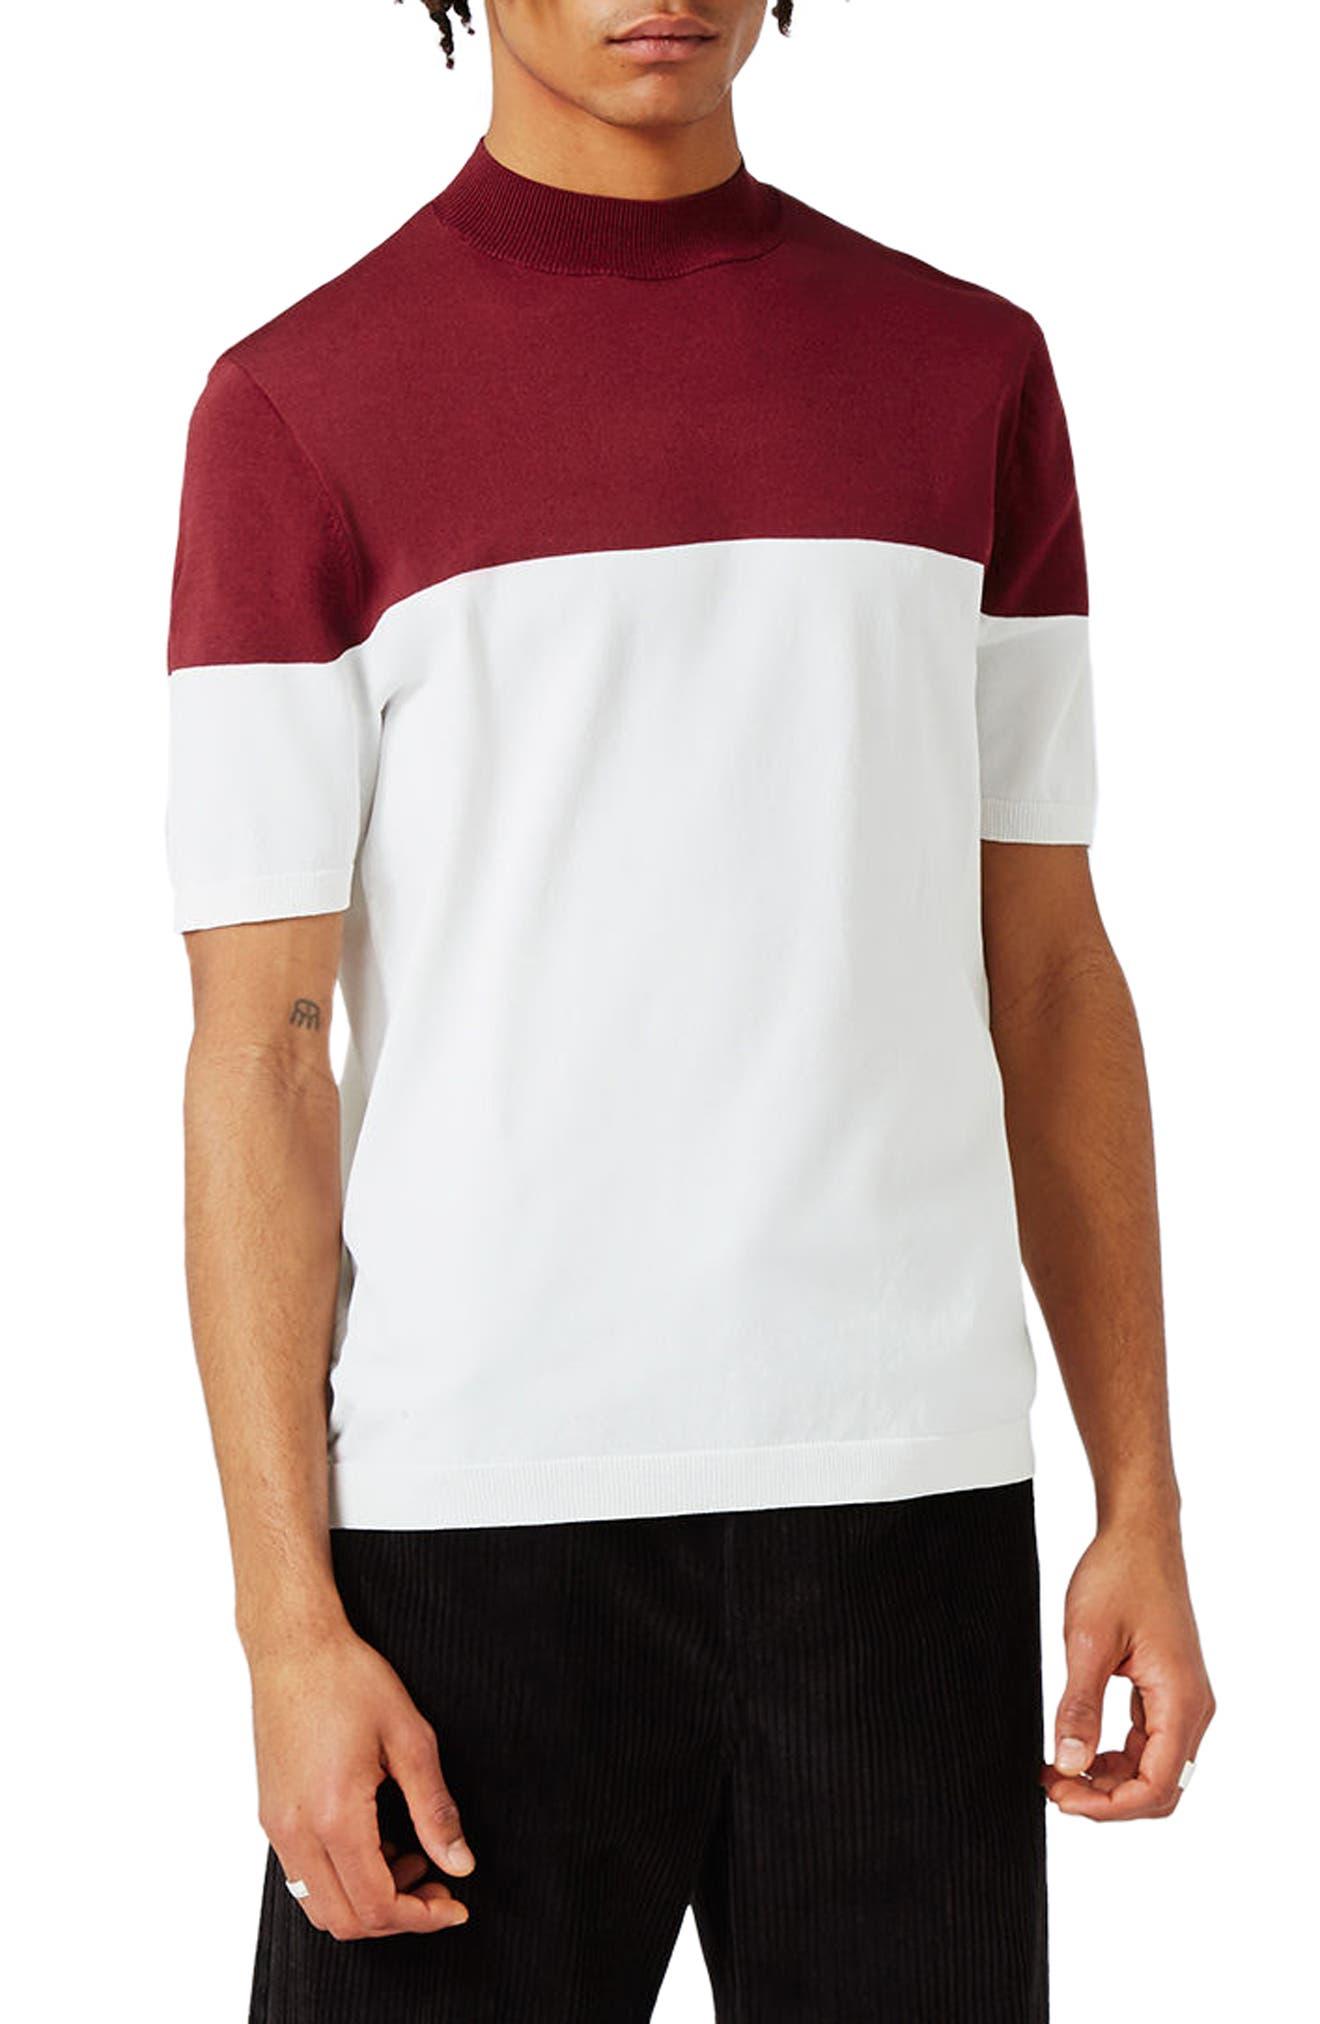 Topman Colorblock Mock Neck Knit T-Shirt